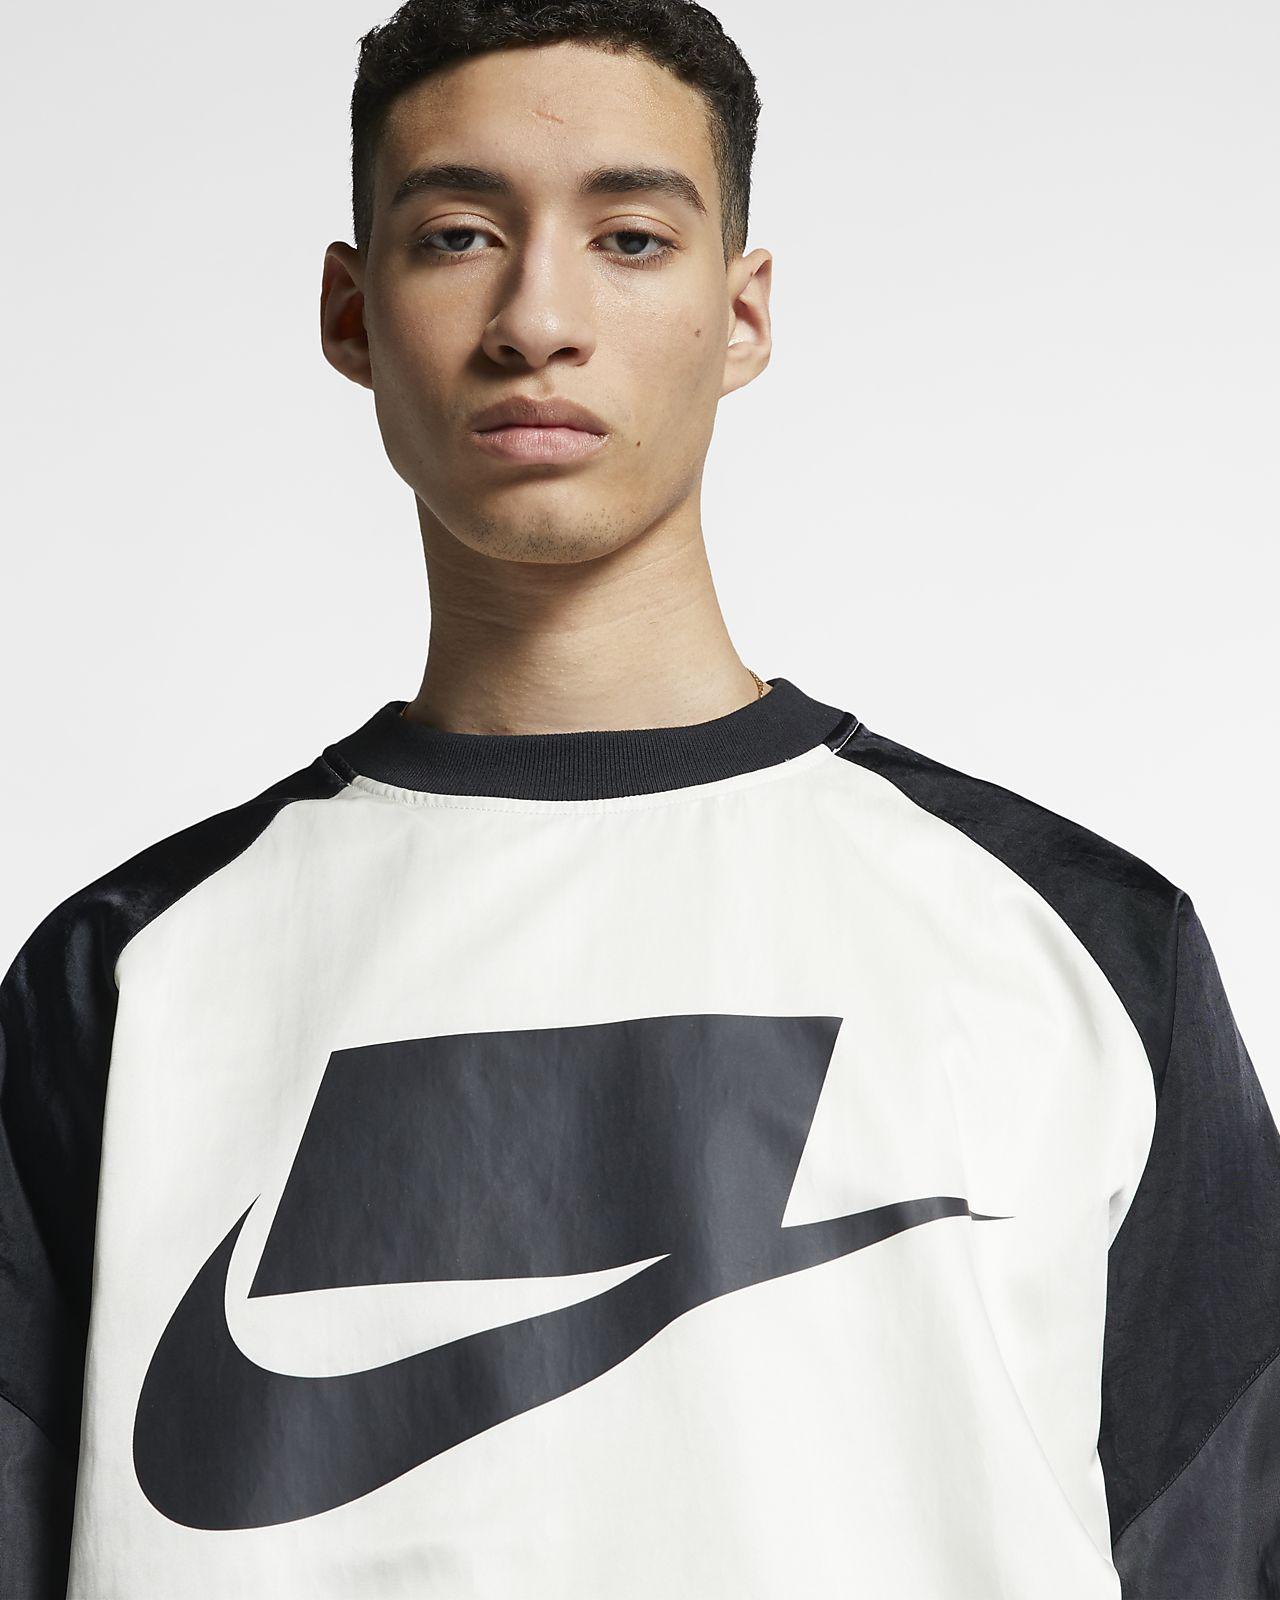 d19ca89cacd903 Nike Sportswear NSW Men s Woven Crew. Nike.com